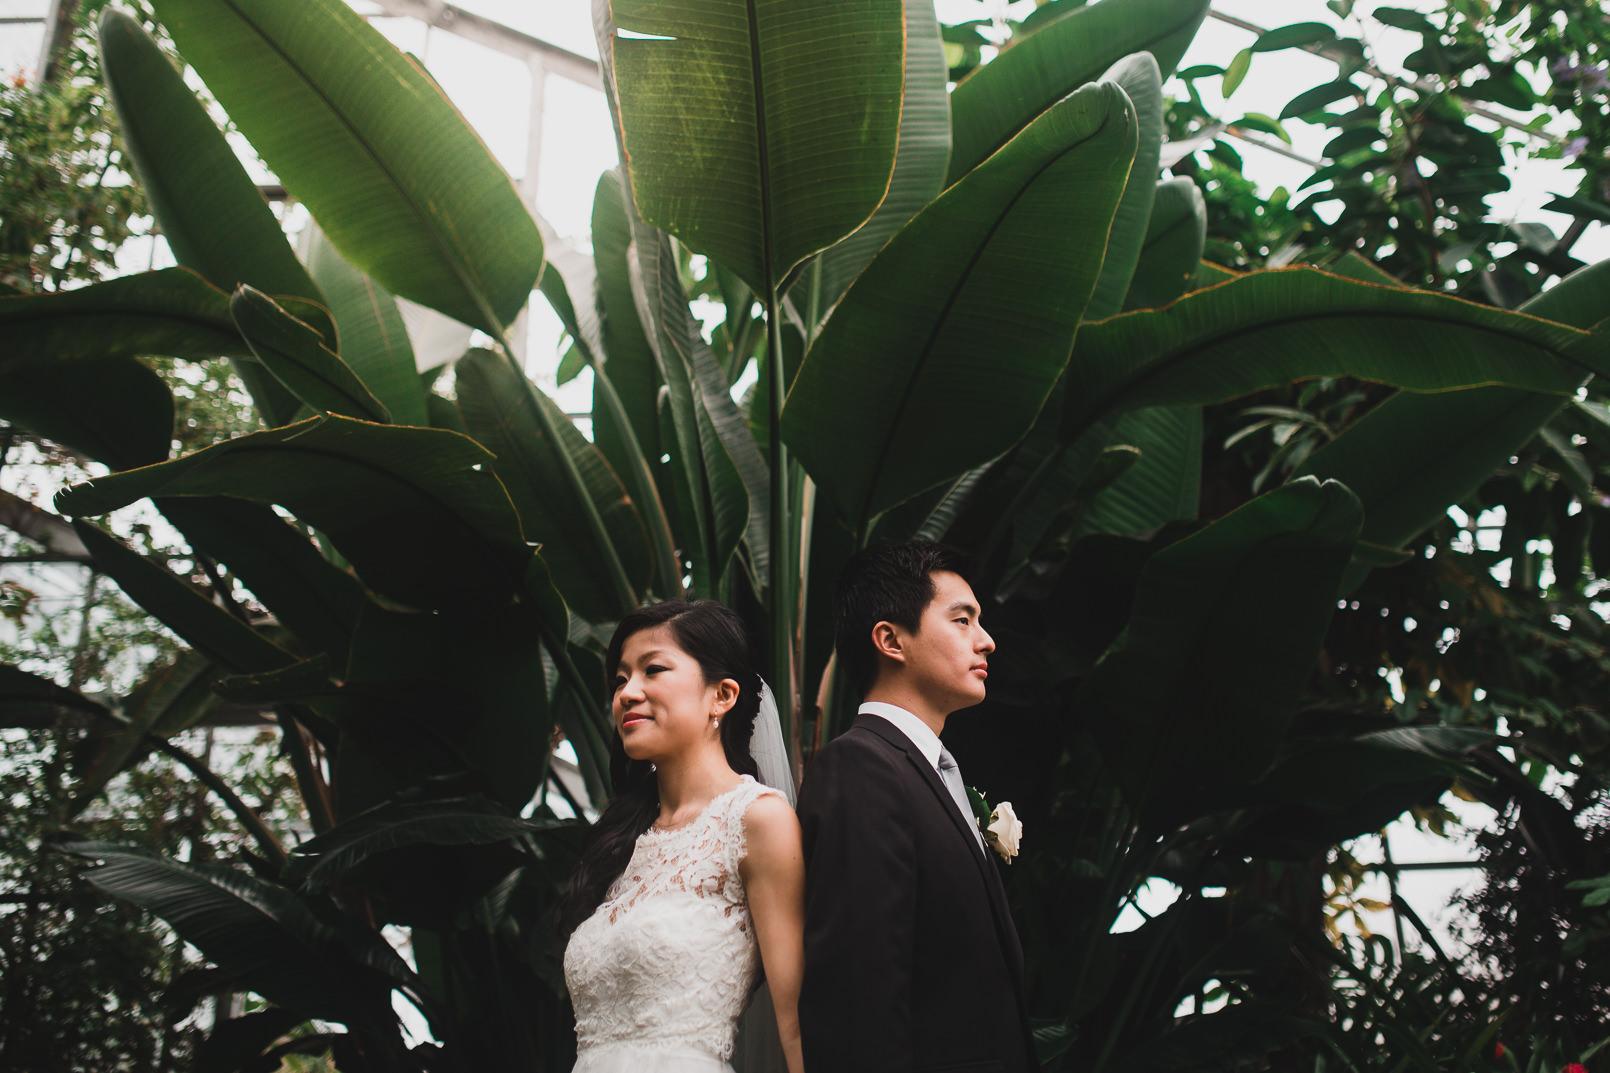 023-Jonathan-Kuhn-Photography-Wedding-_mini.jpg